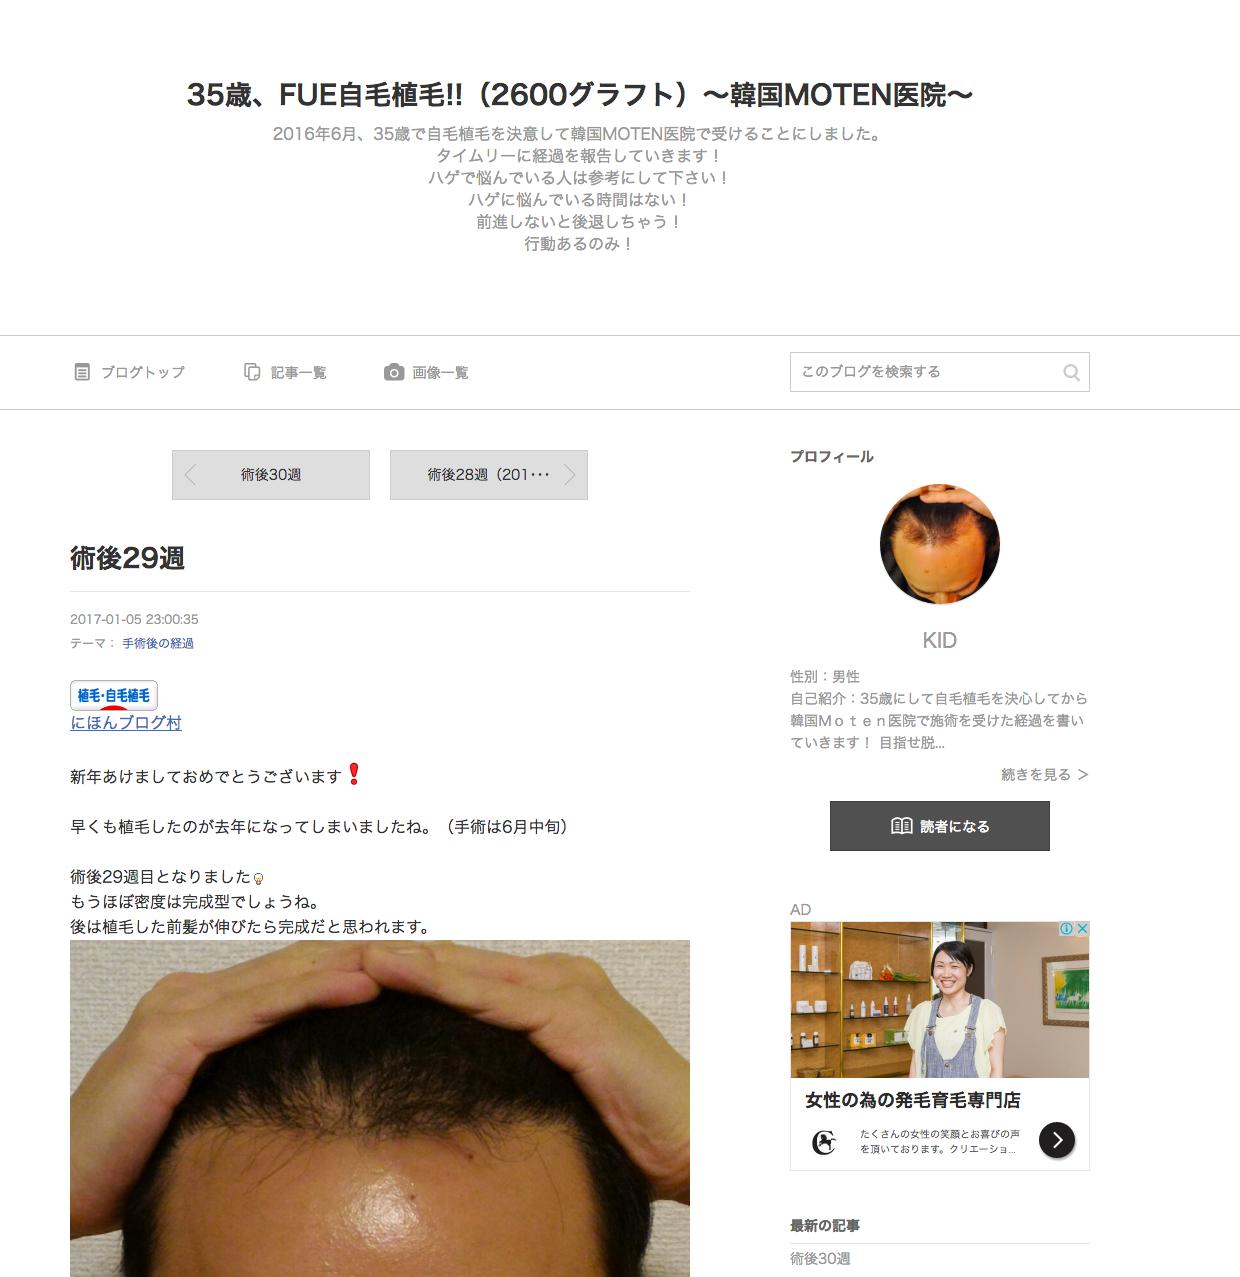 AGA若ハゲの治療 35歳、FUE自毛植毛!!(2600グラフト)~韓国MOTEN医院~